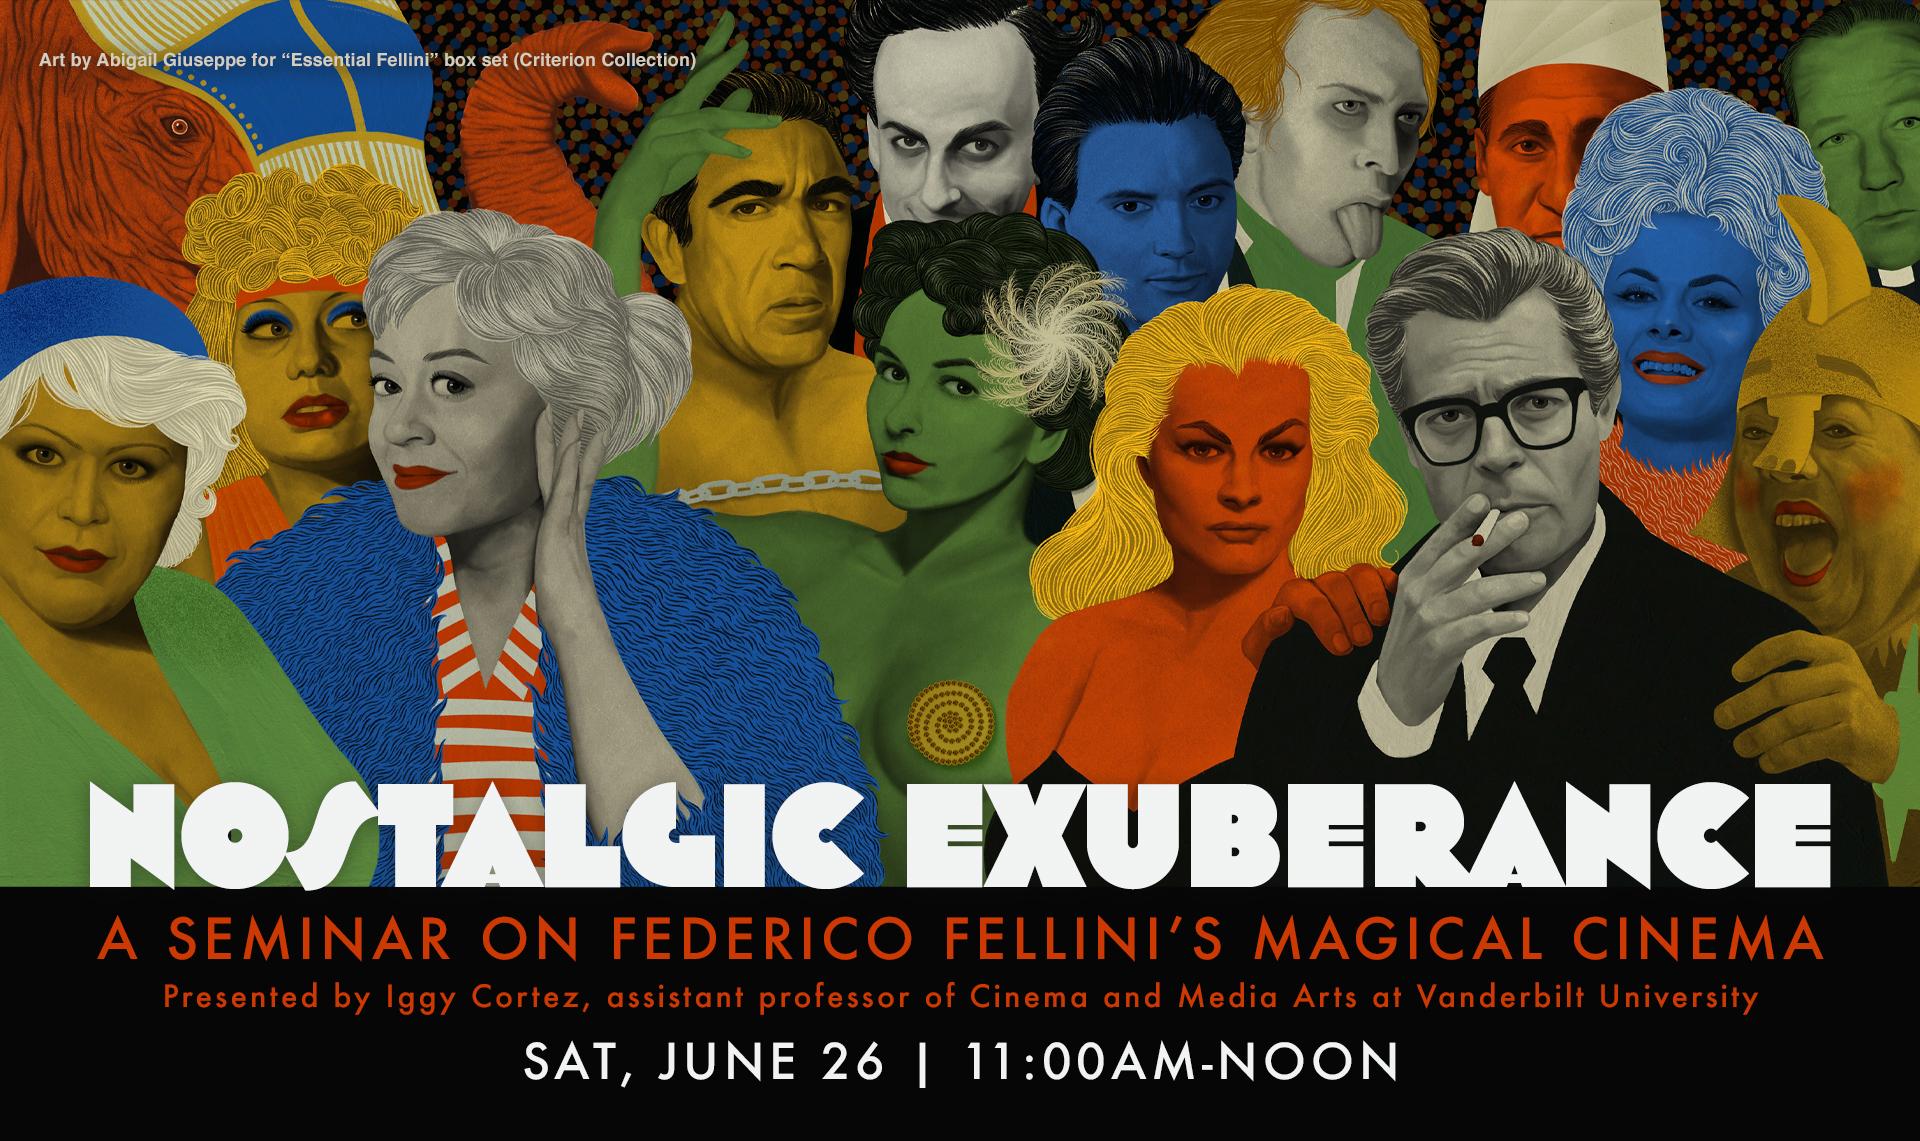 Nostalgic Exuberance: A Seminar on Federico Fellini's Magical Cinema